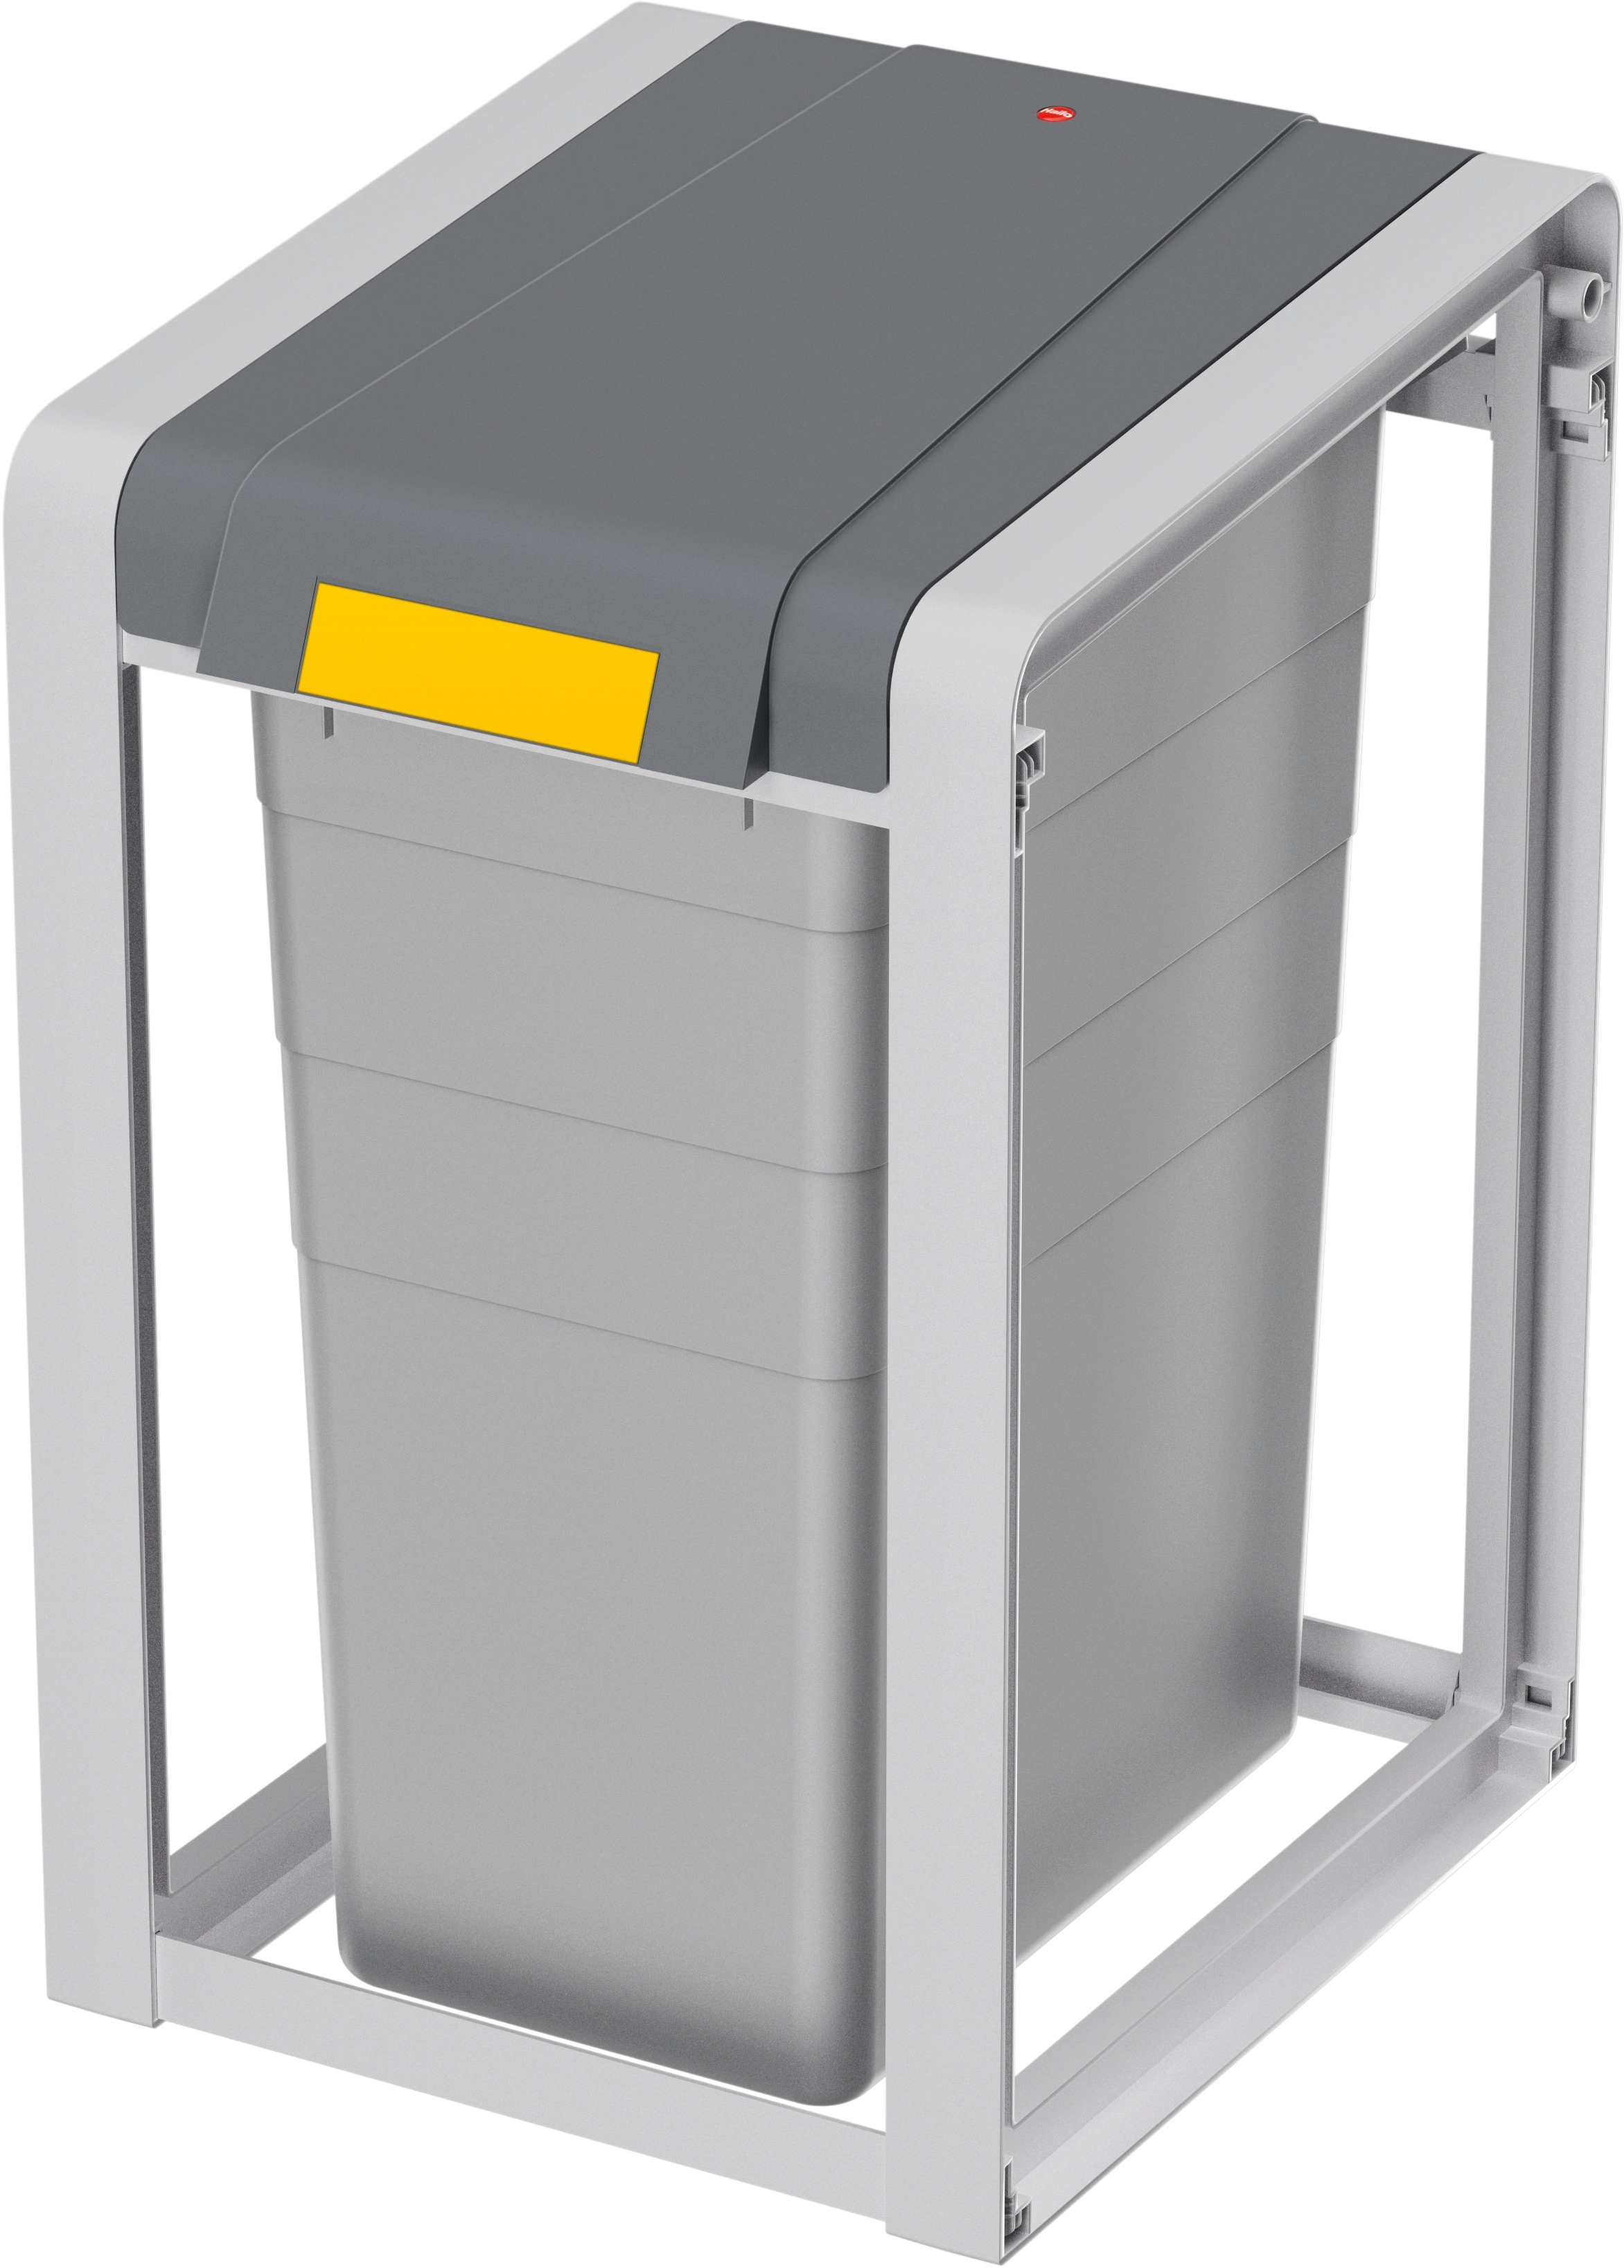 Hailo Mülltrennsystem ProfiLine Öko XL,Basiseinheit,38l grau Küche Ordnung Mülleimer